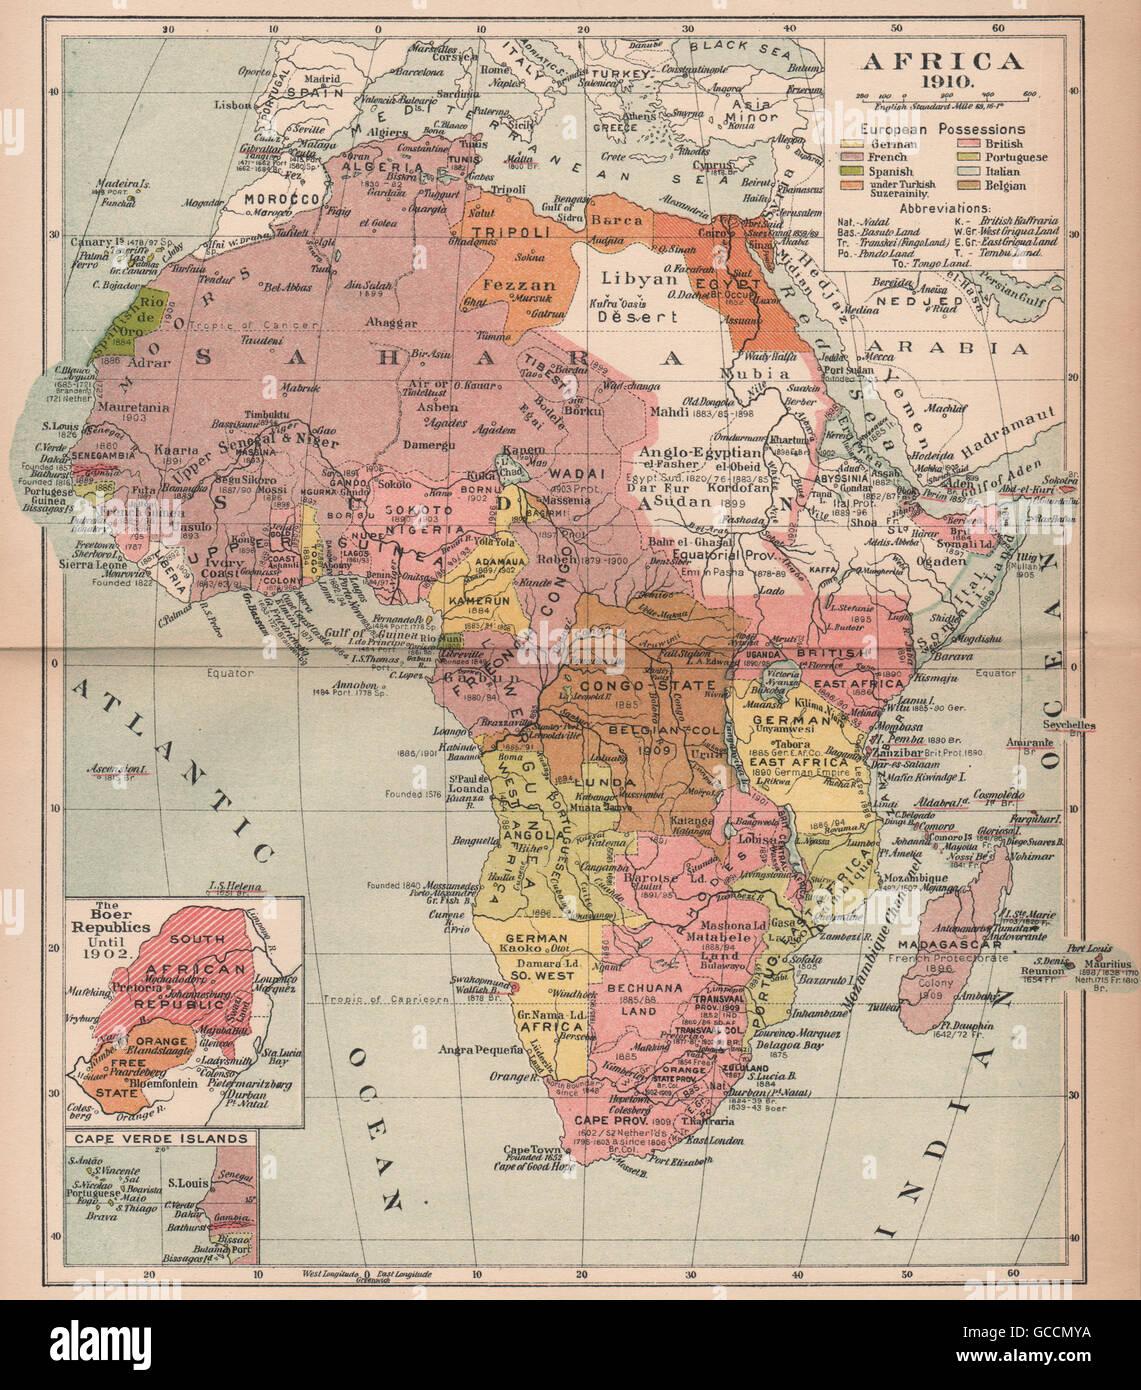 Partition Of Africa Map.Africa 1910 Partition Of Africa Colonisation British French